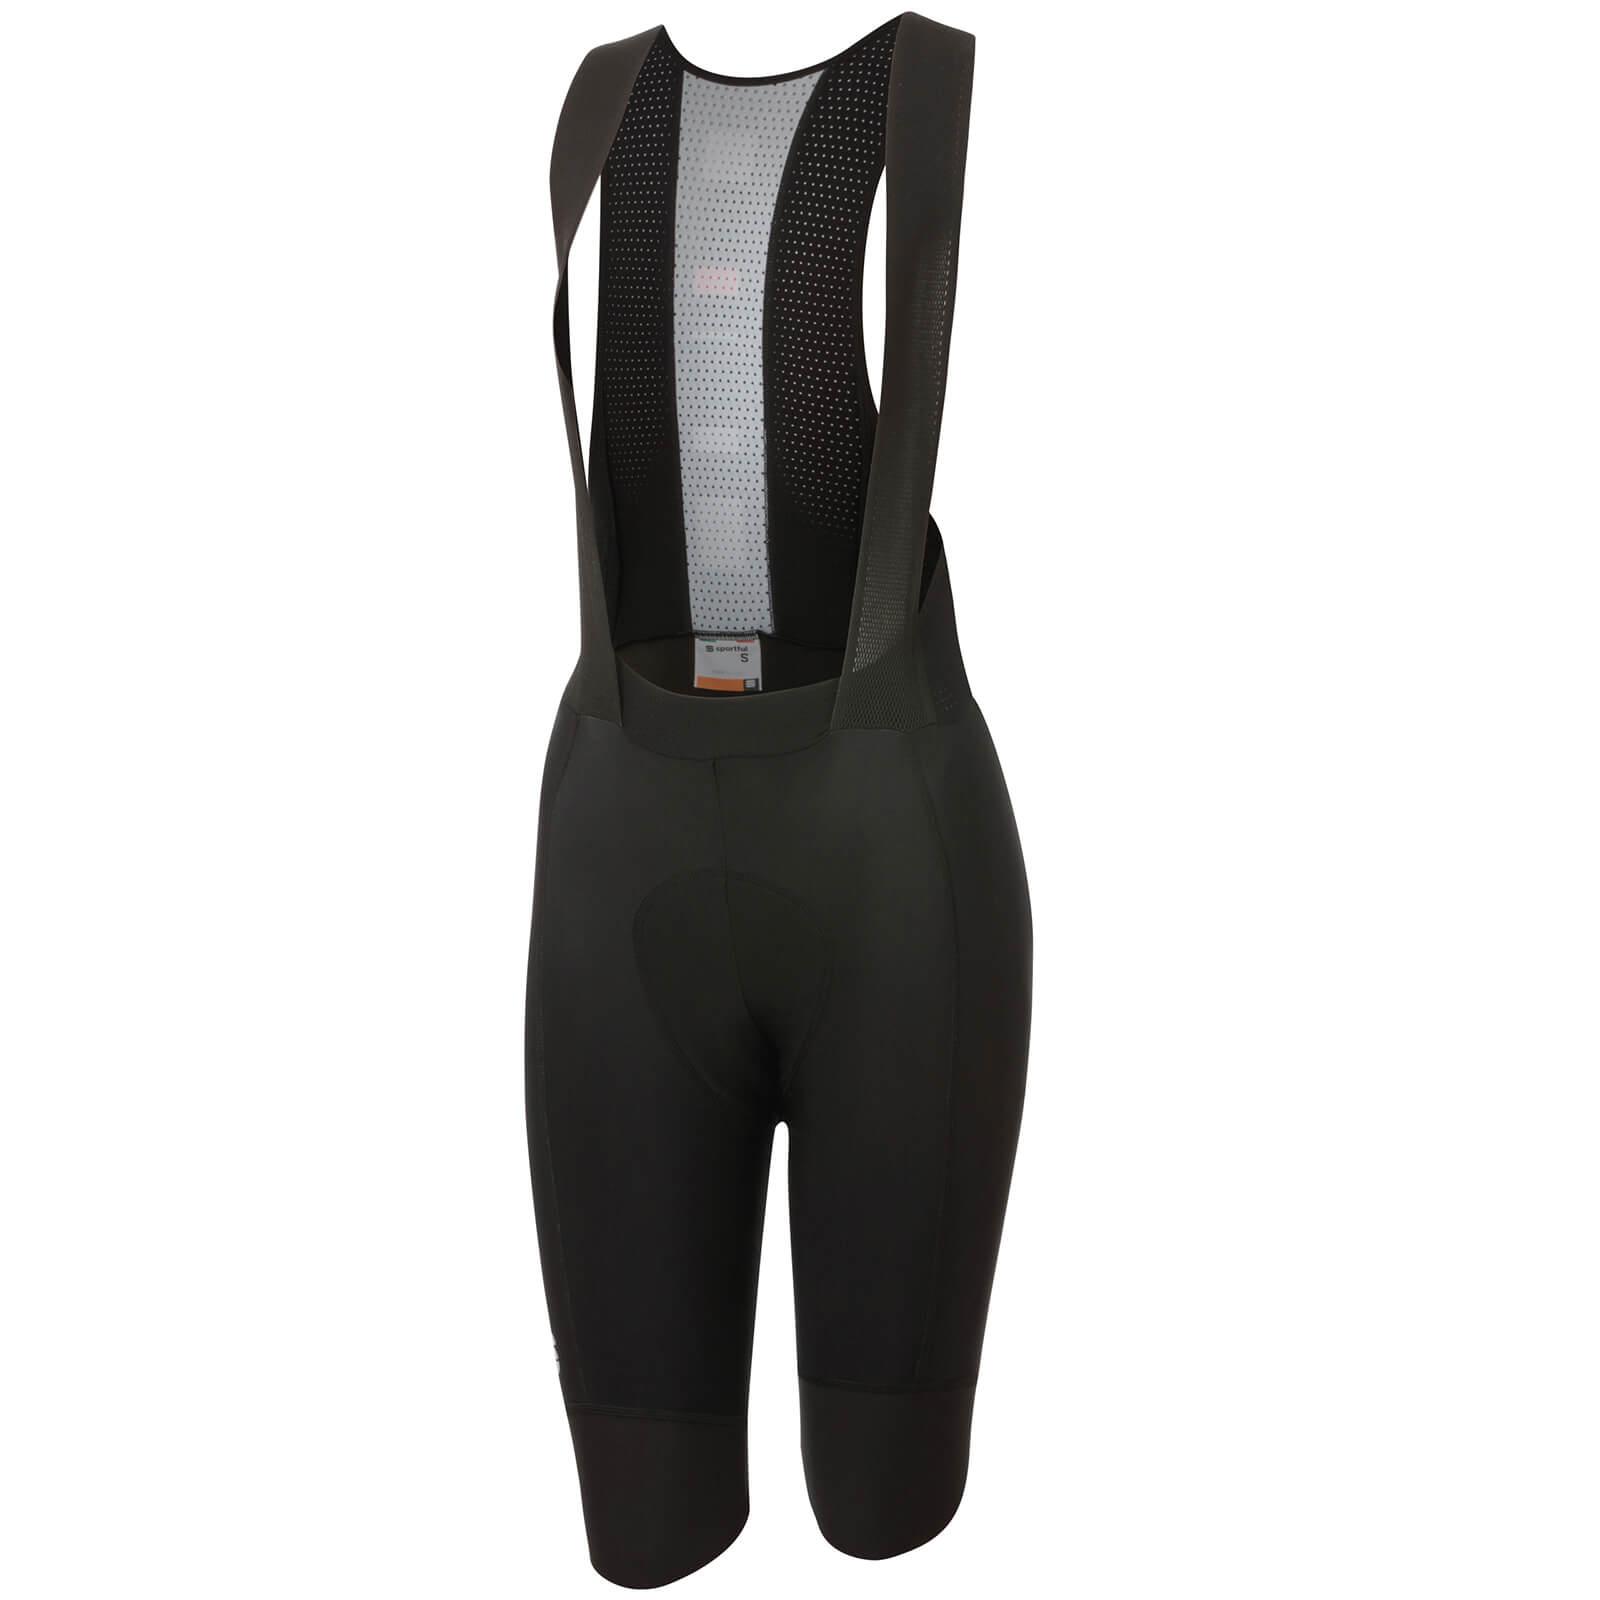 Sportful Women's Bodyfit Pro Thermal Bib Shorts - XS